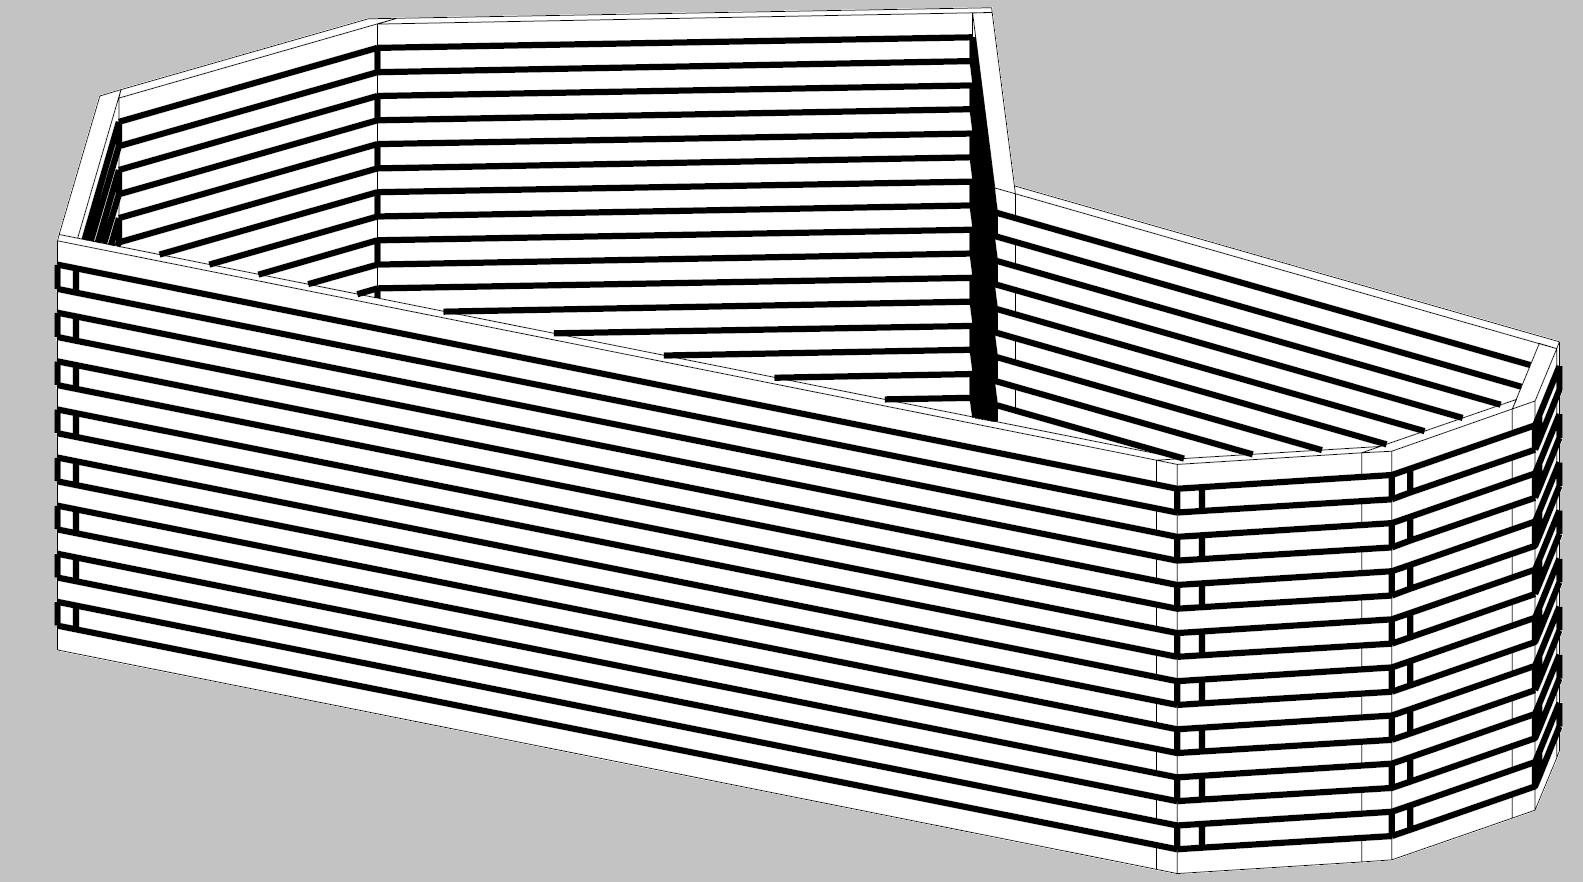 3d Modell vom Holzrahmen